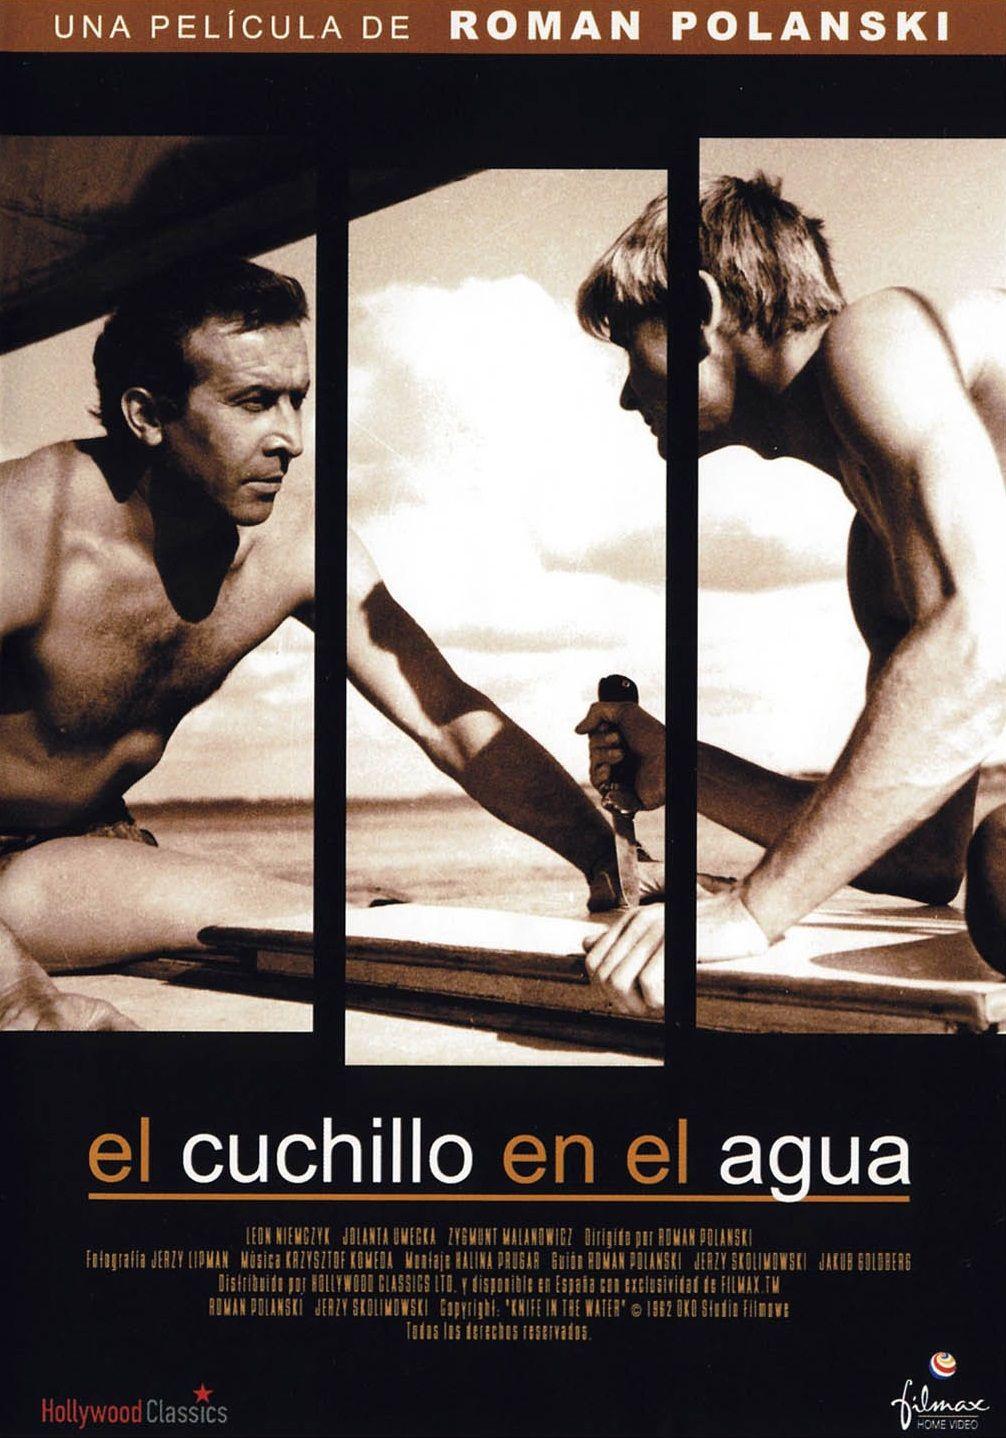 El Cuchillo En El Agua 1962 Polonia Dir Roman Polanski Drama Thriller Dvd Cine 568 Sinopse Iate Filmes